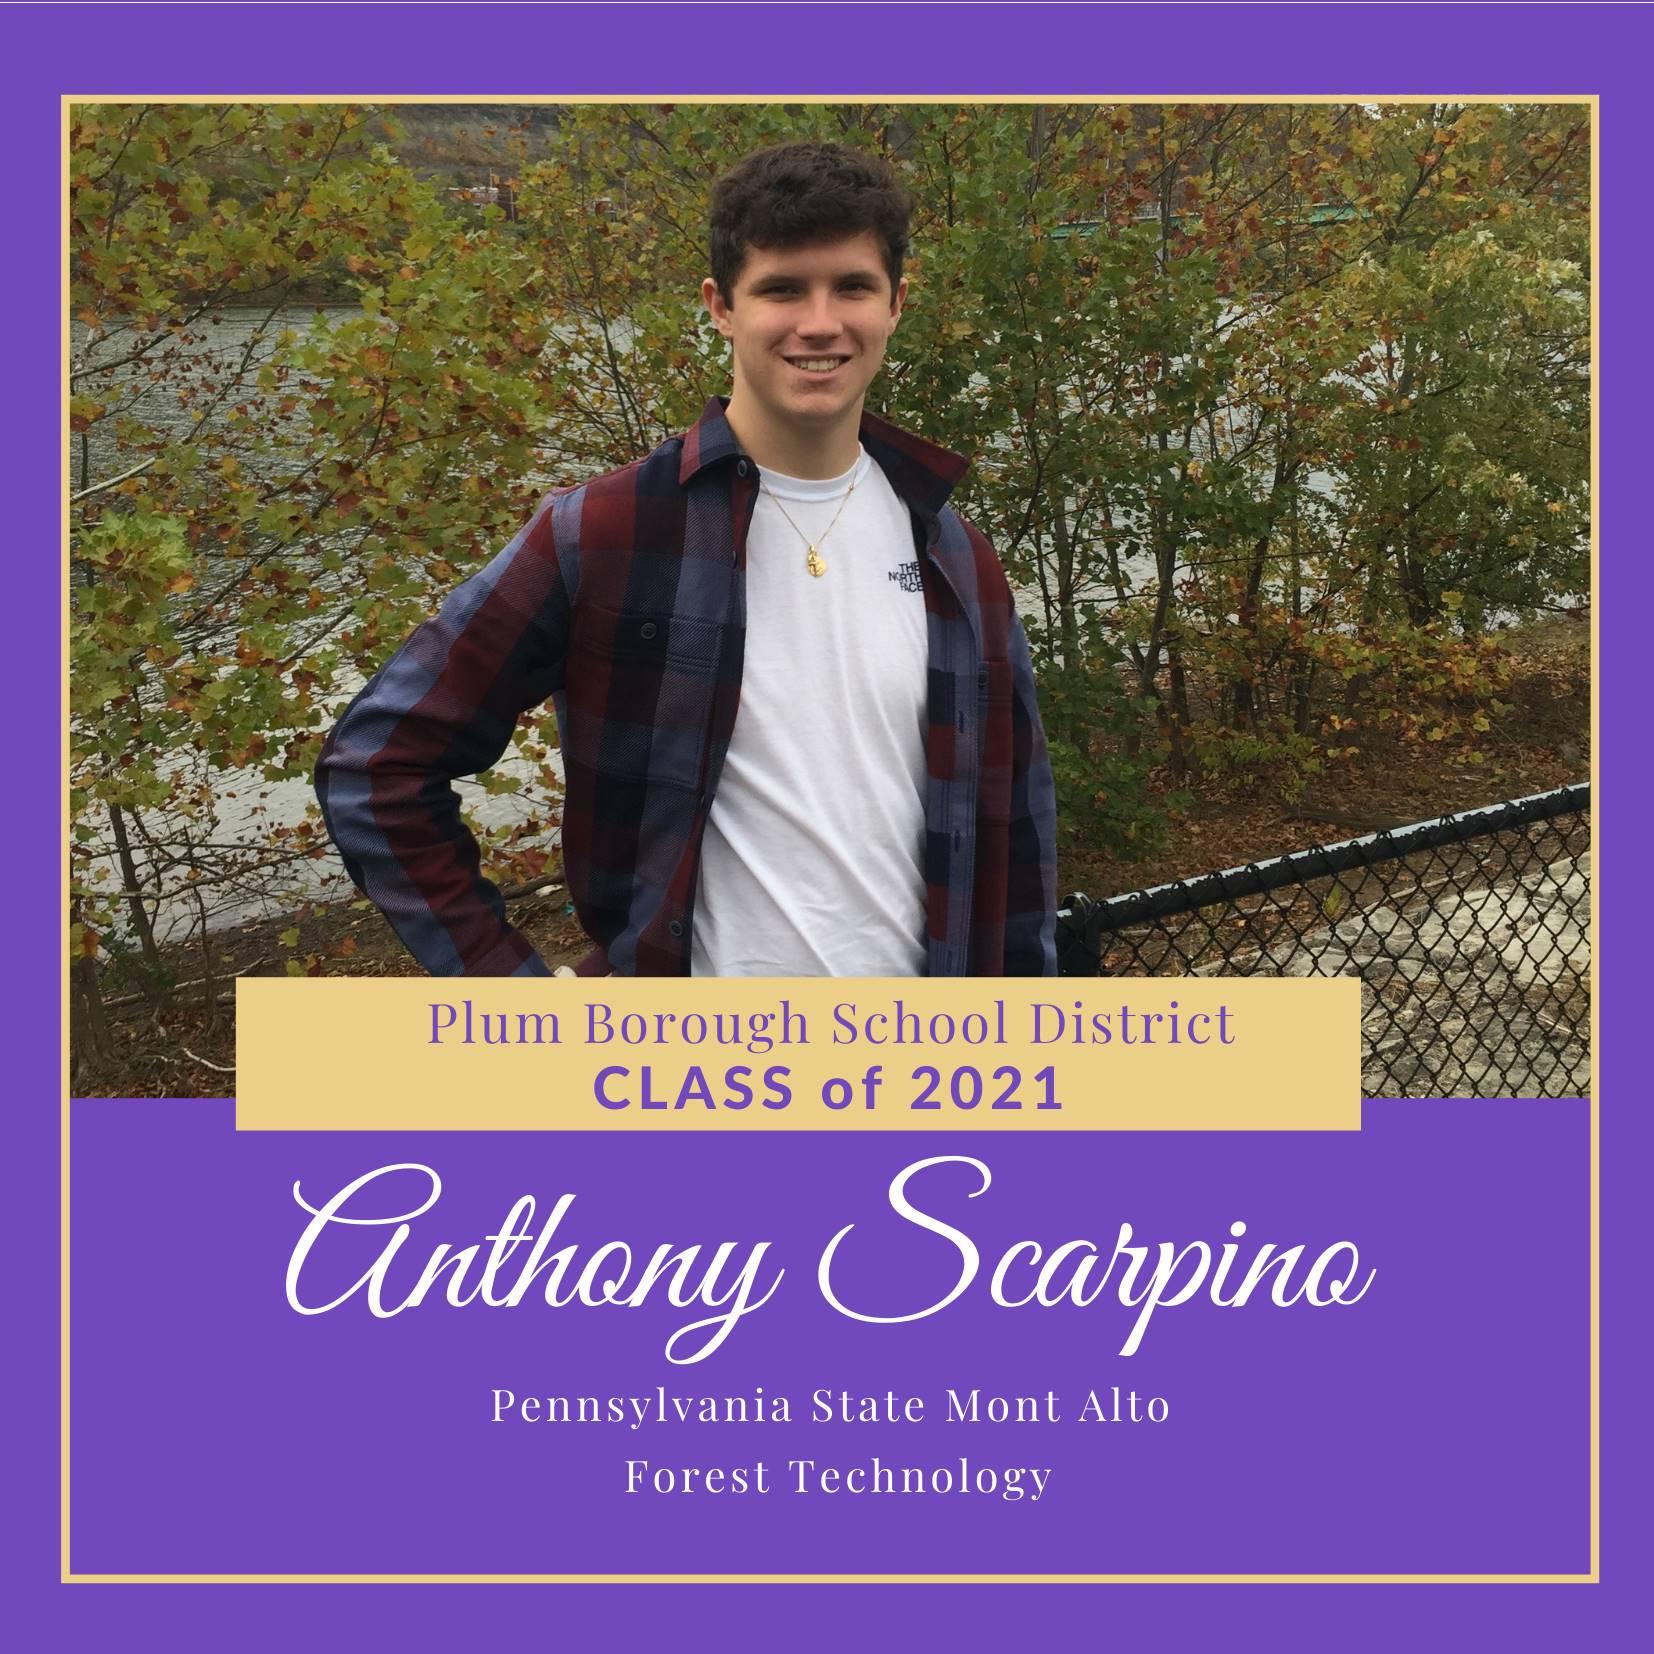 Congratulations to Anthony Scarpino, Class of 2021!